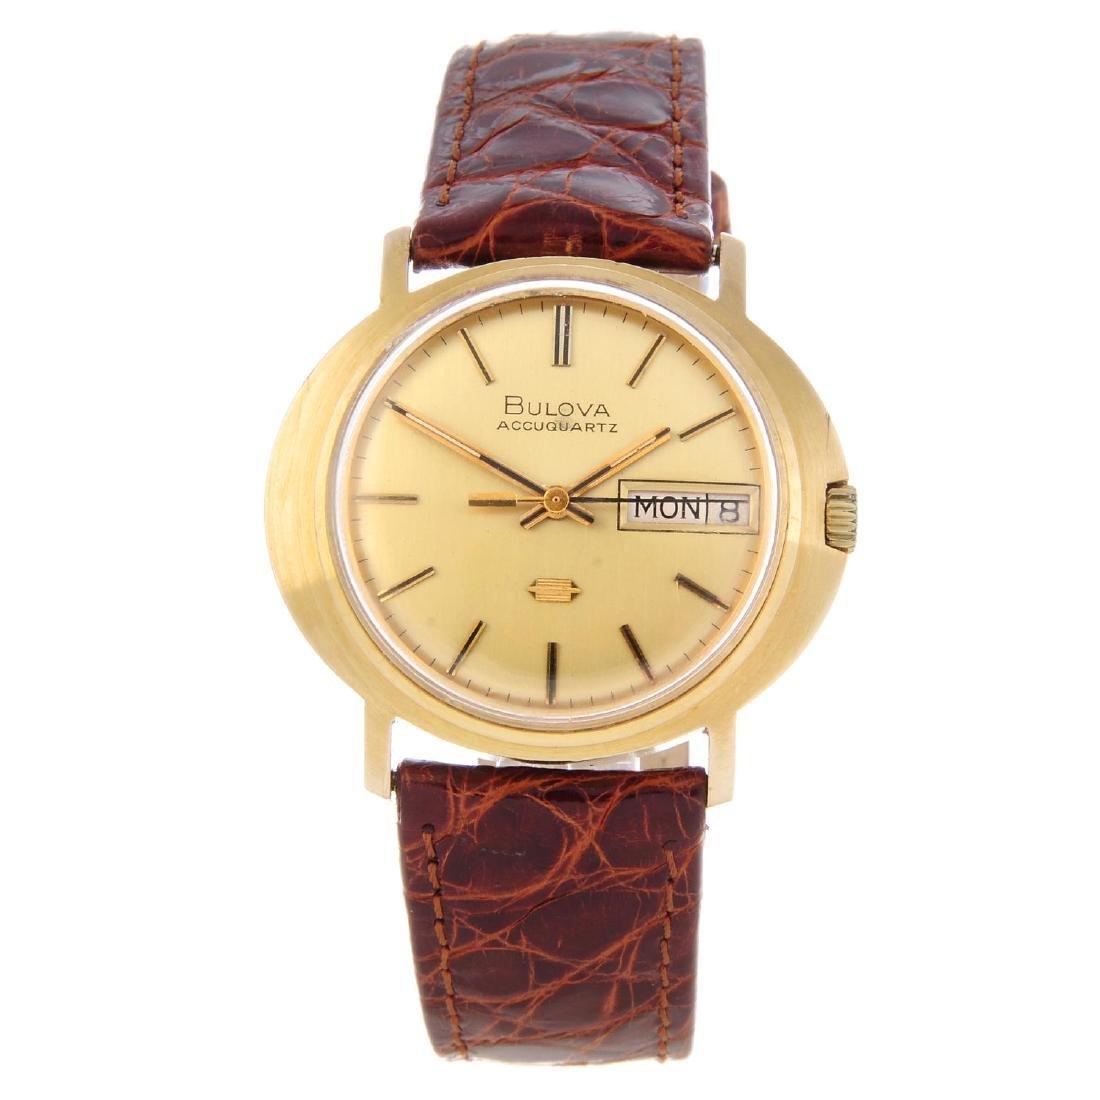 BULOVA - a gentleman's Accuquartz wrist watch. 9ct